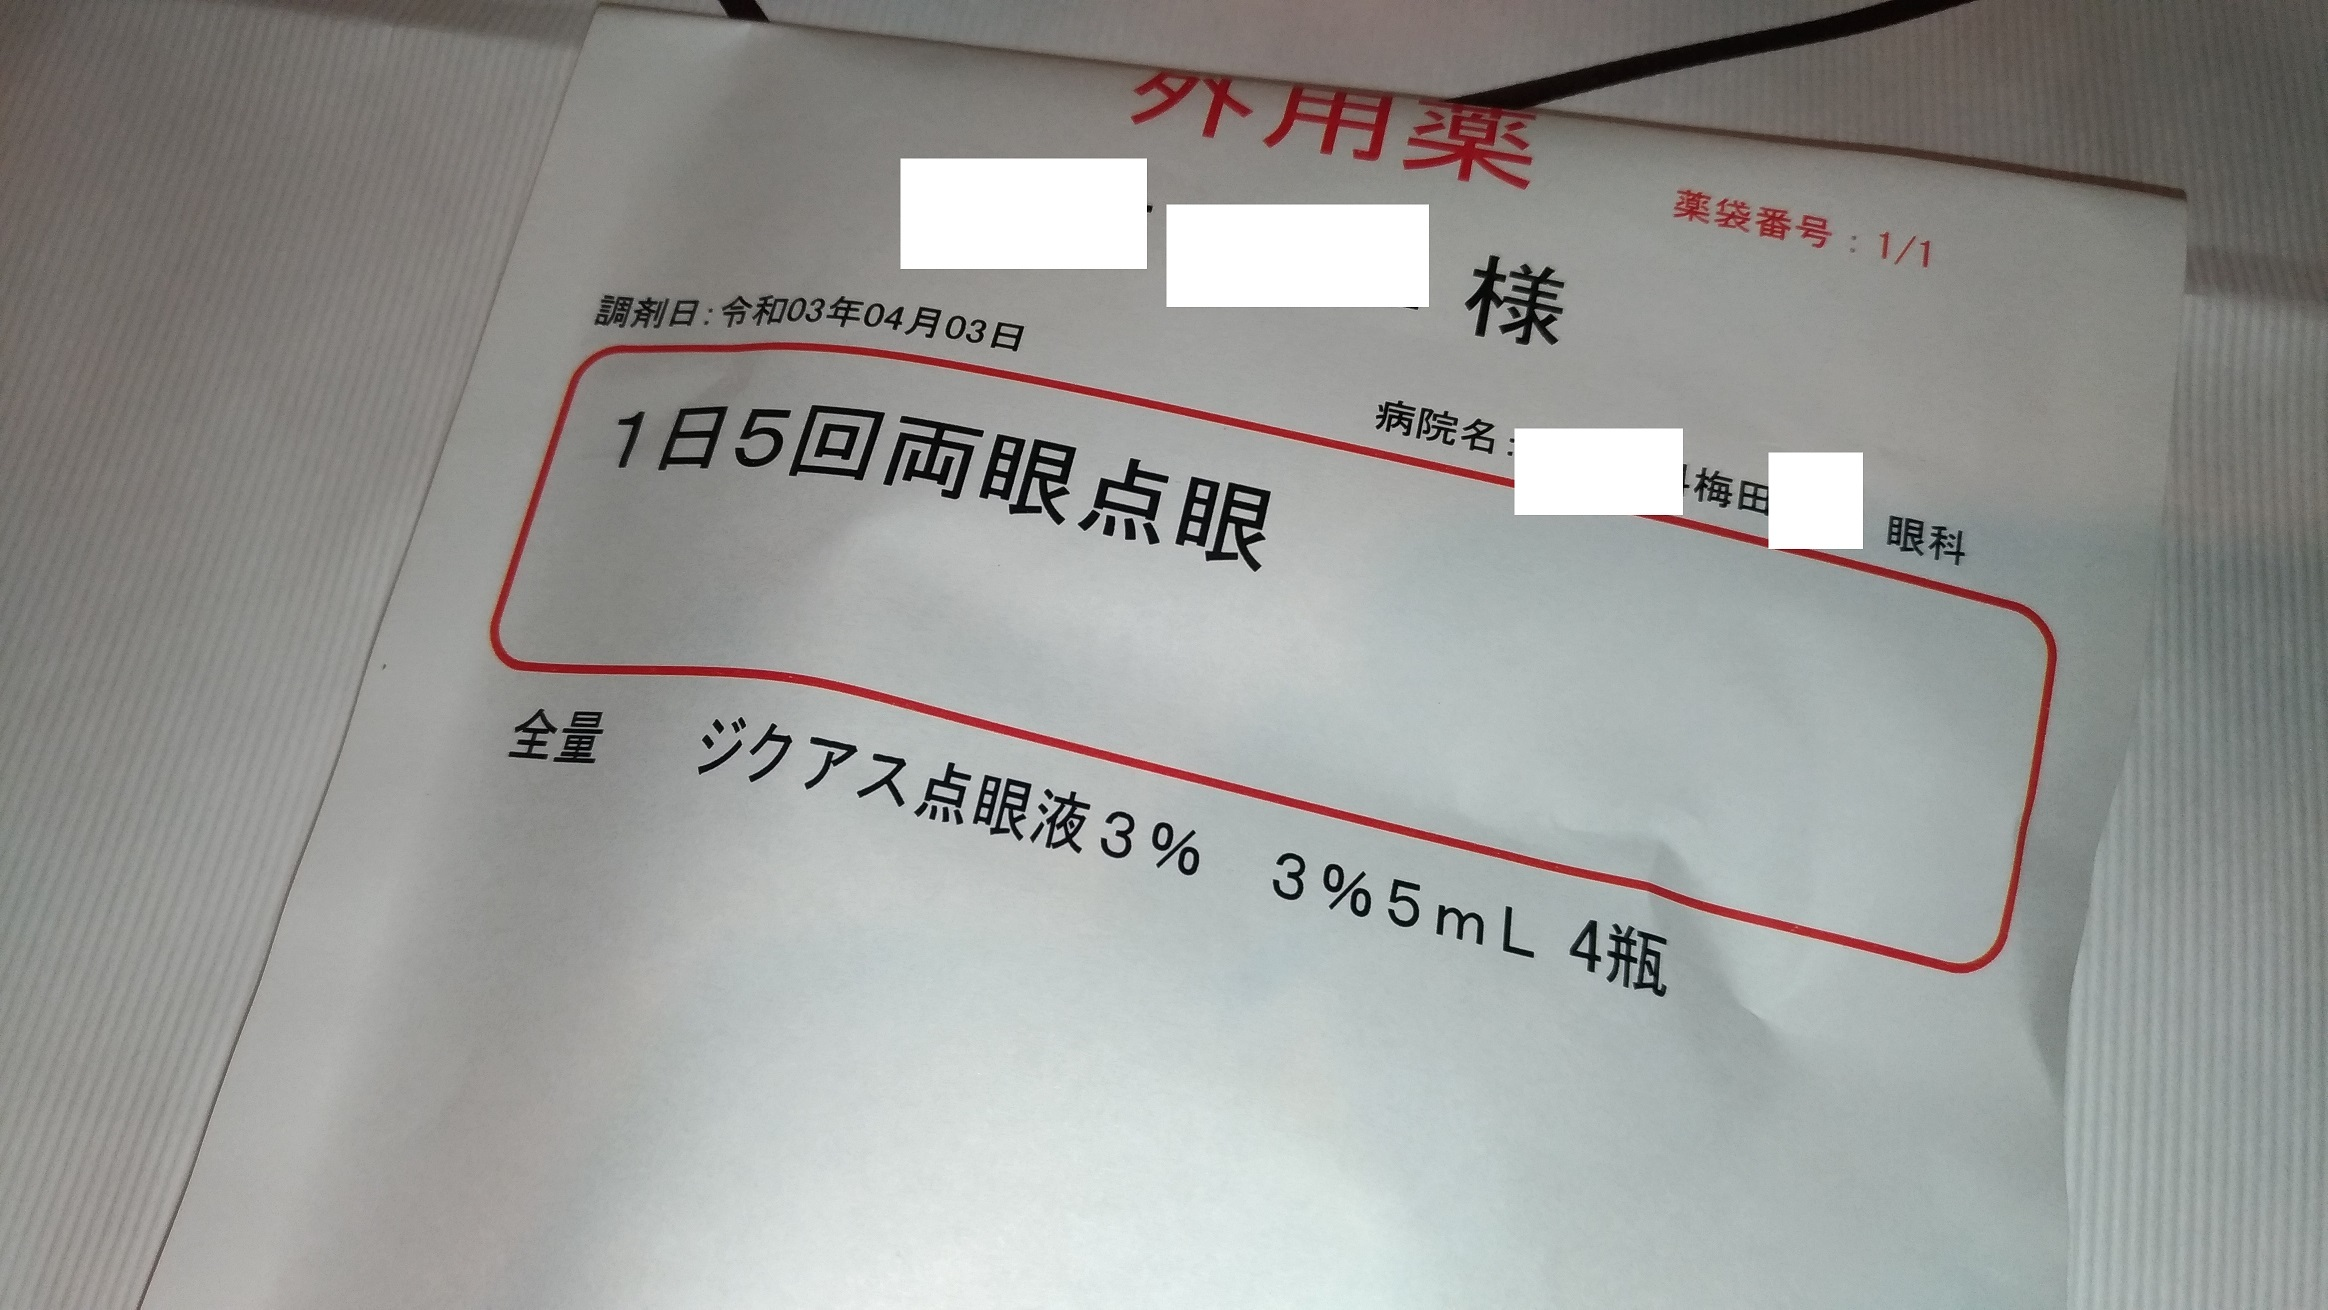 zutsu_me_ganka_emgusuri_1.jpg